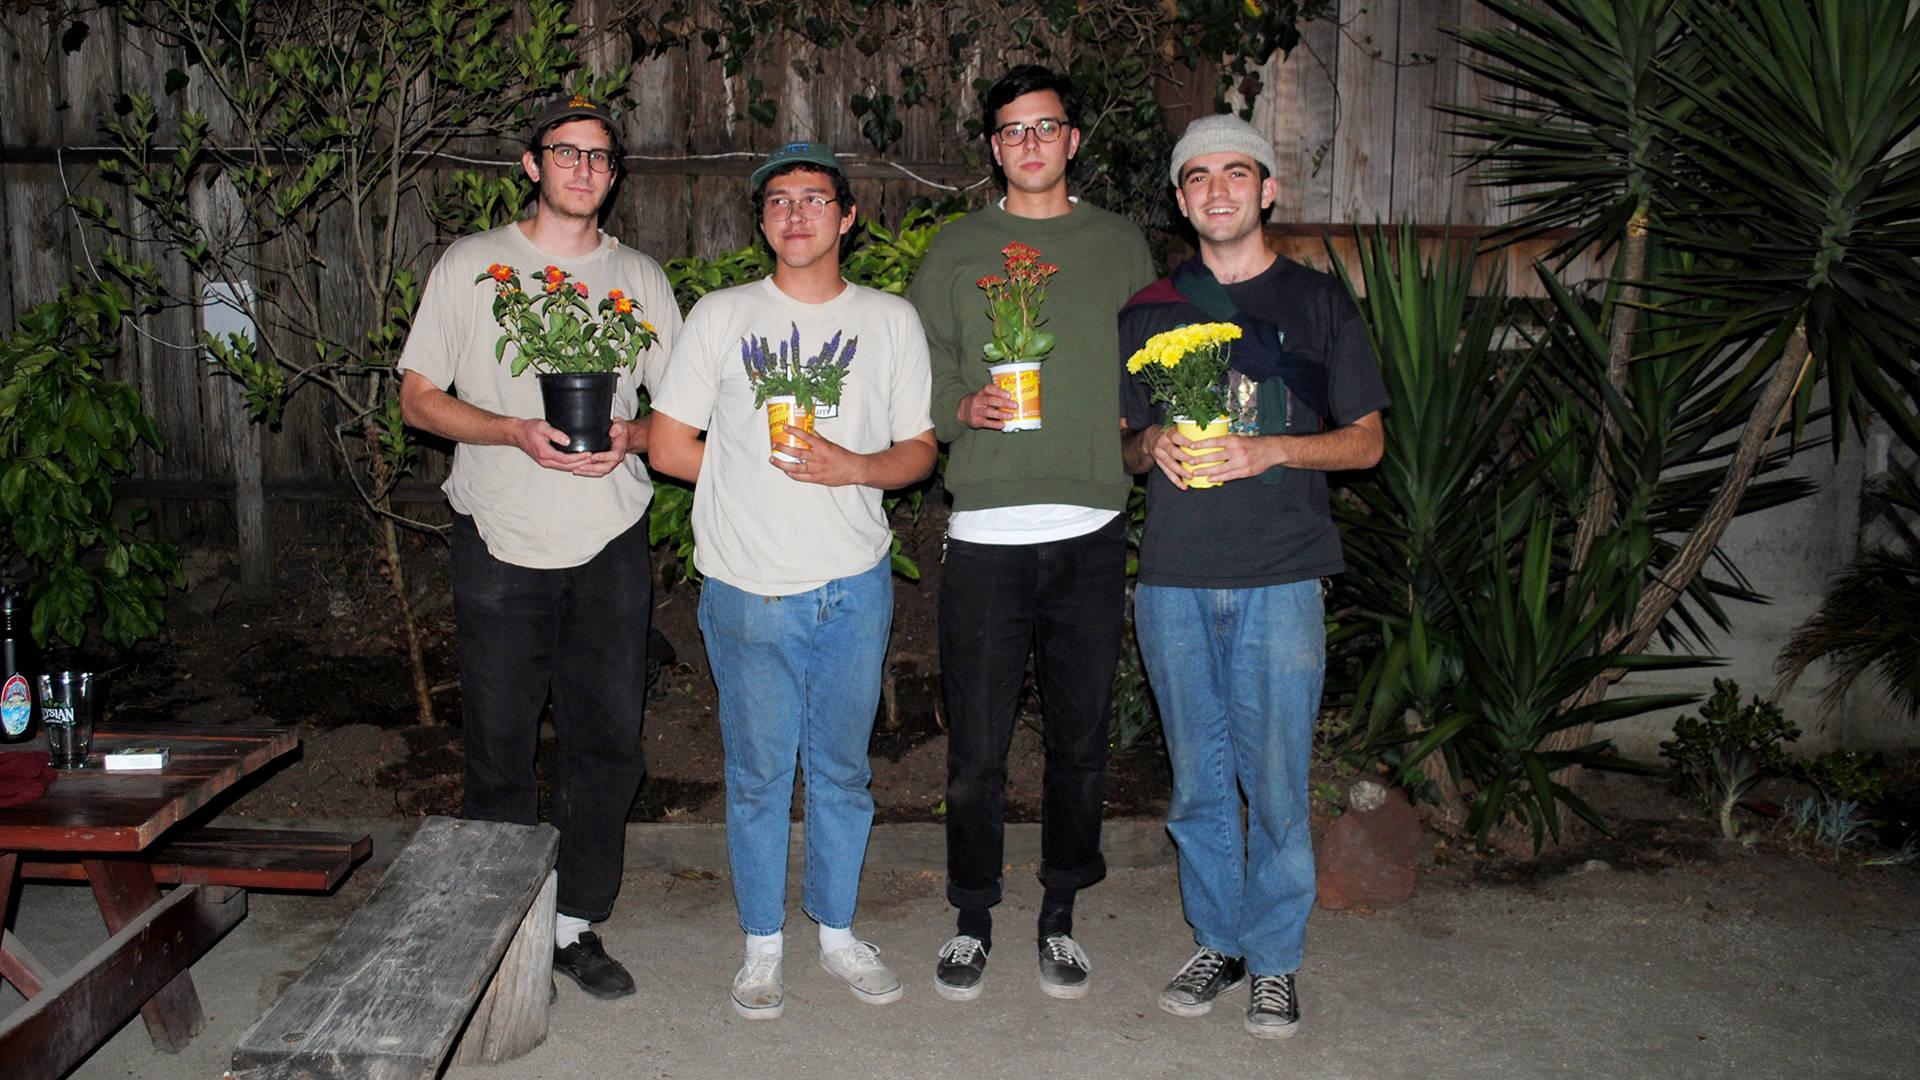 Pardoner's Trey Flanigan, Max Freeland, River Van Den Berghe, and Will Mervau (left to right) met at San Francisco State University.  Nastia Voynovskaya